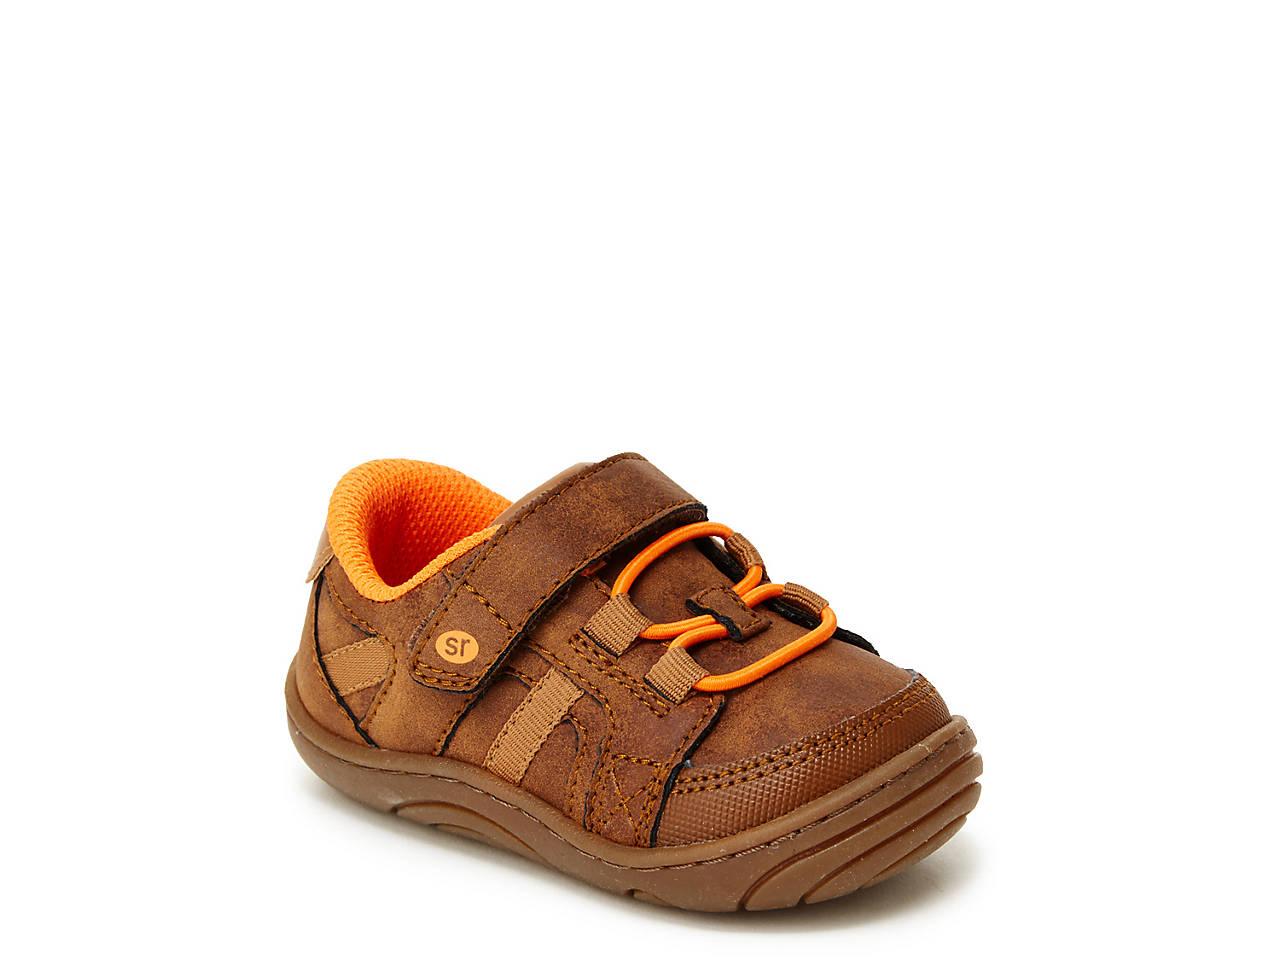 8791a66752ed Stride Rite Bert Infant   Toddler Sneaker Kids Shoes